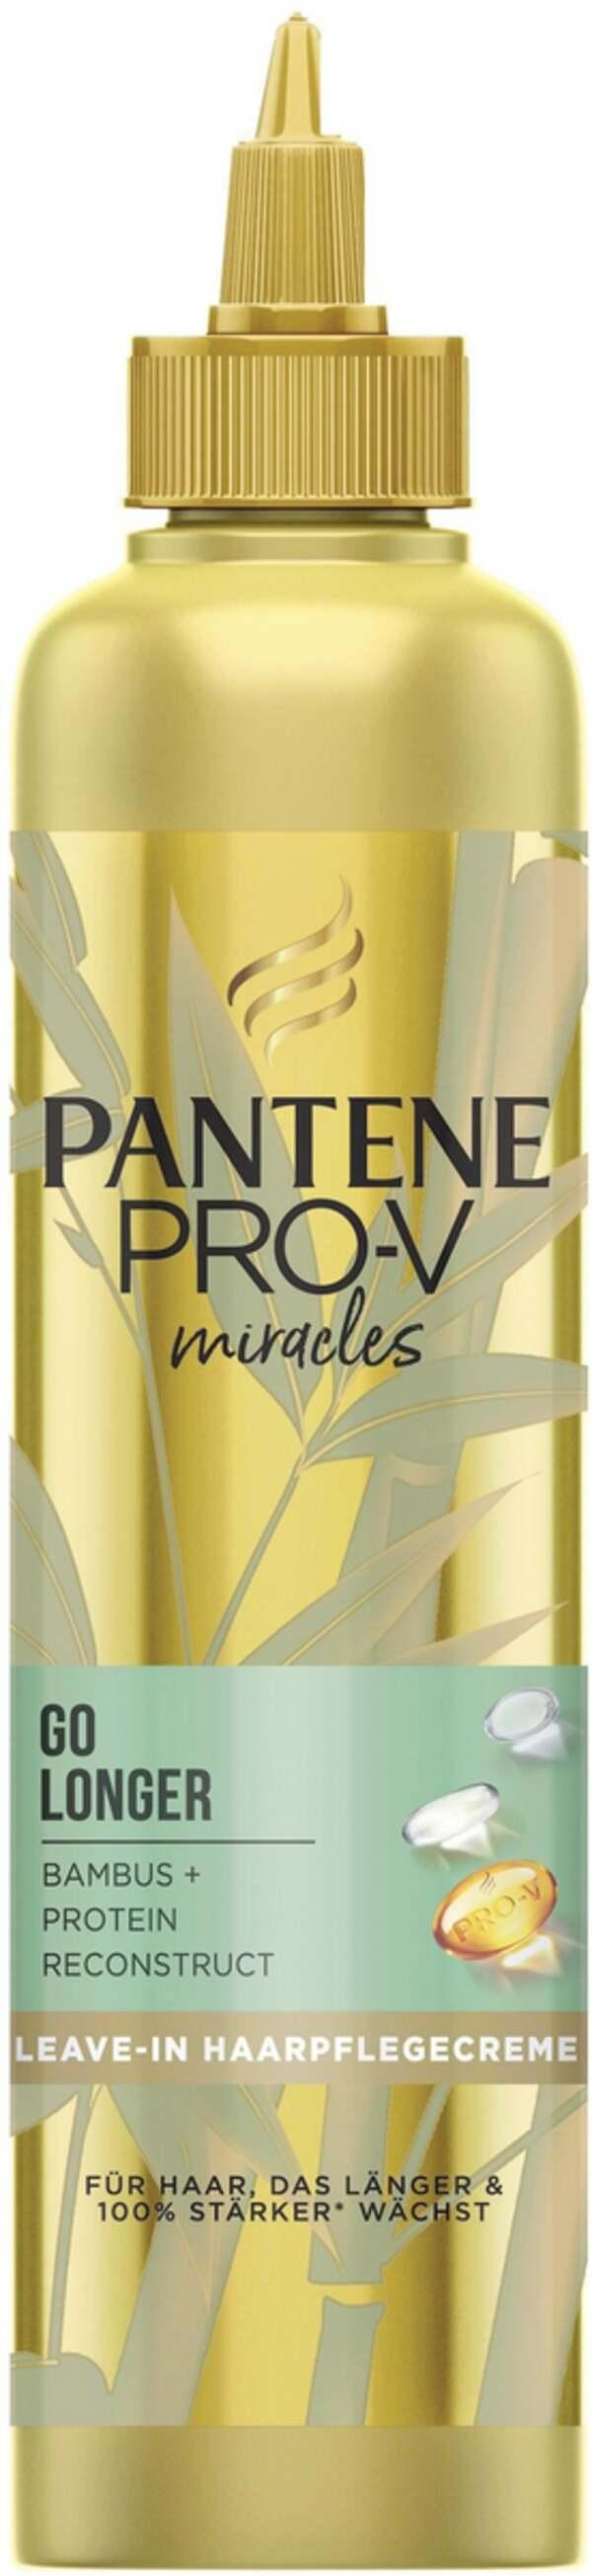 Pantene Pro-V Miracles Go Longer Protein Reconstruct Leave-In Haarpflegecreme